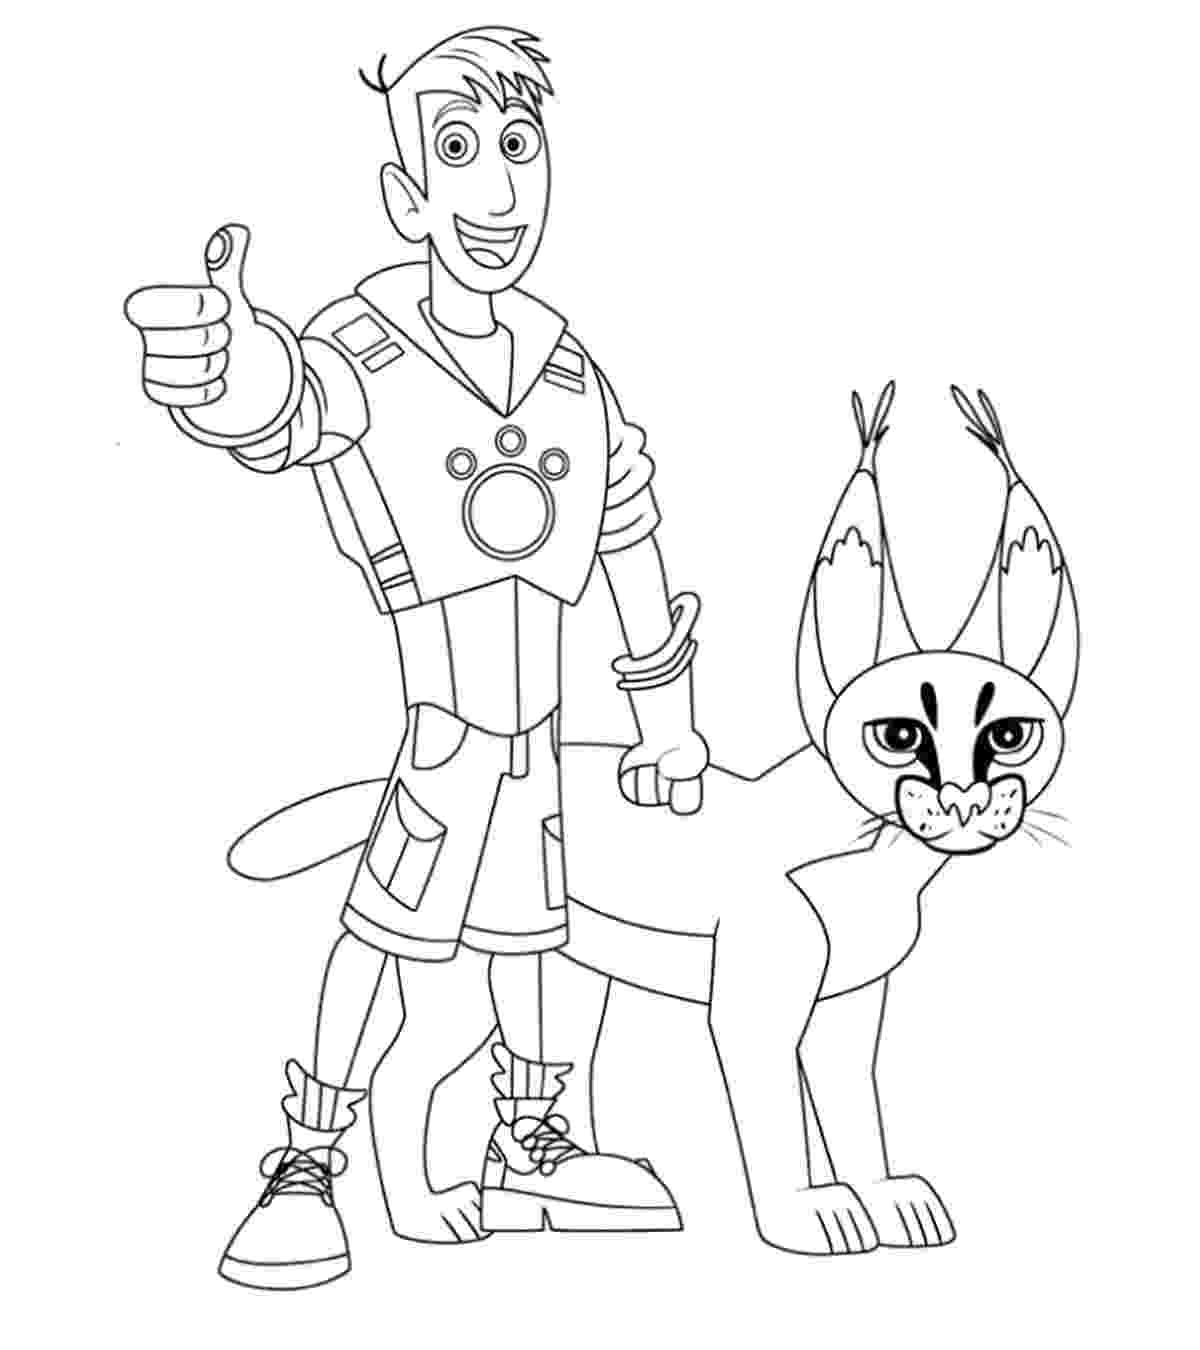 wild kratts coloring wild kratts coloring pages best coloring pages for kids coloring kratts wild 1 1